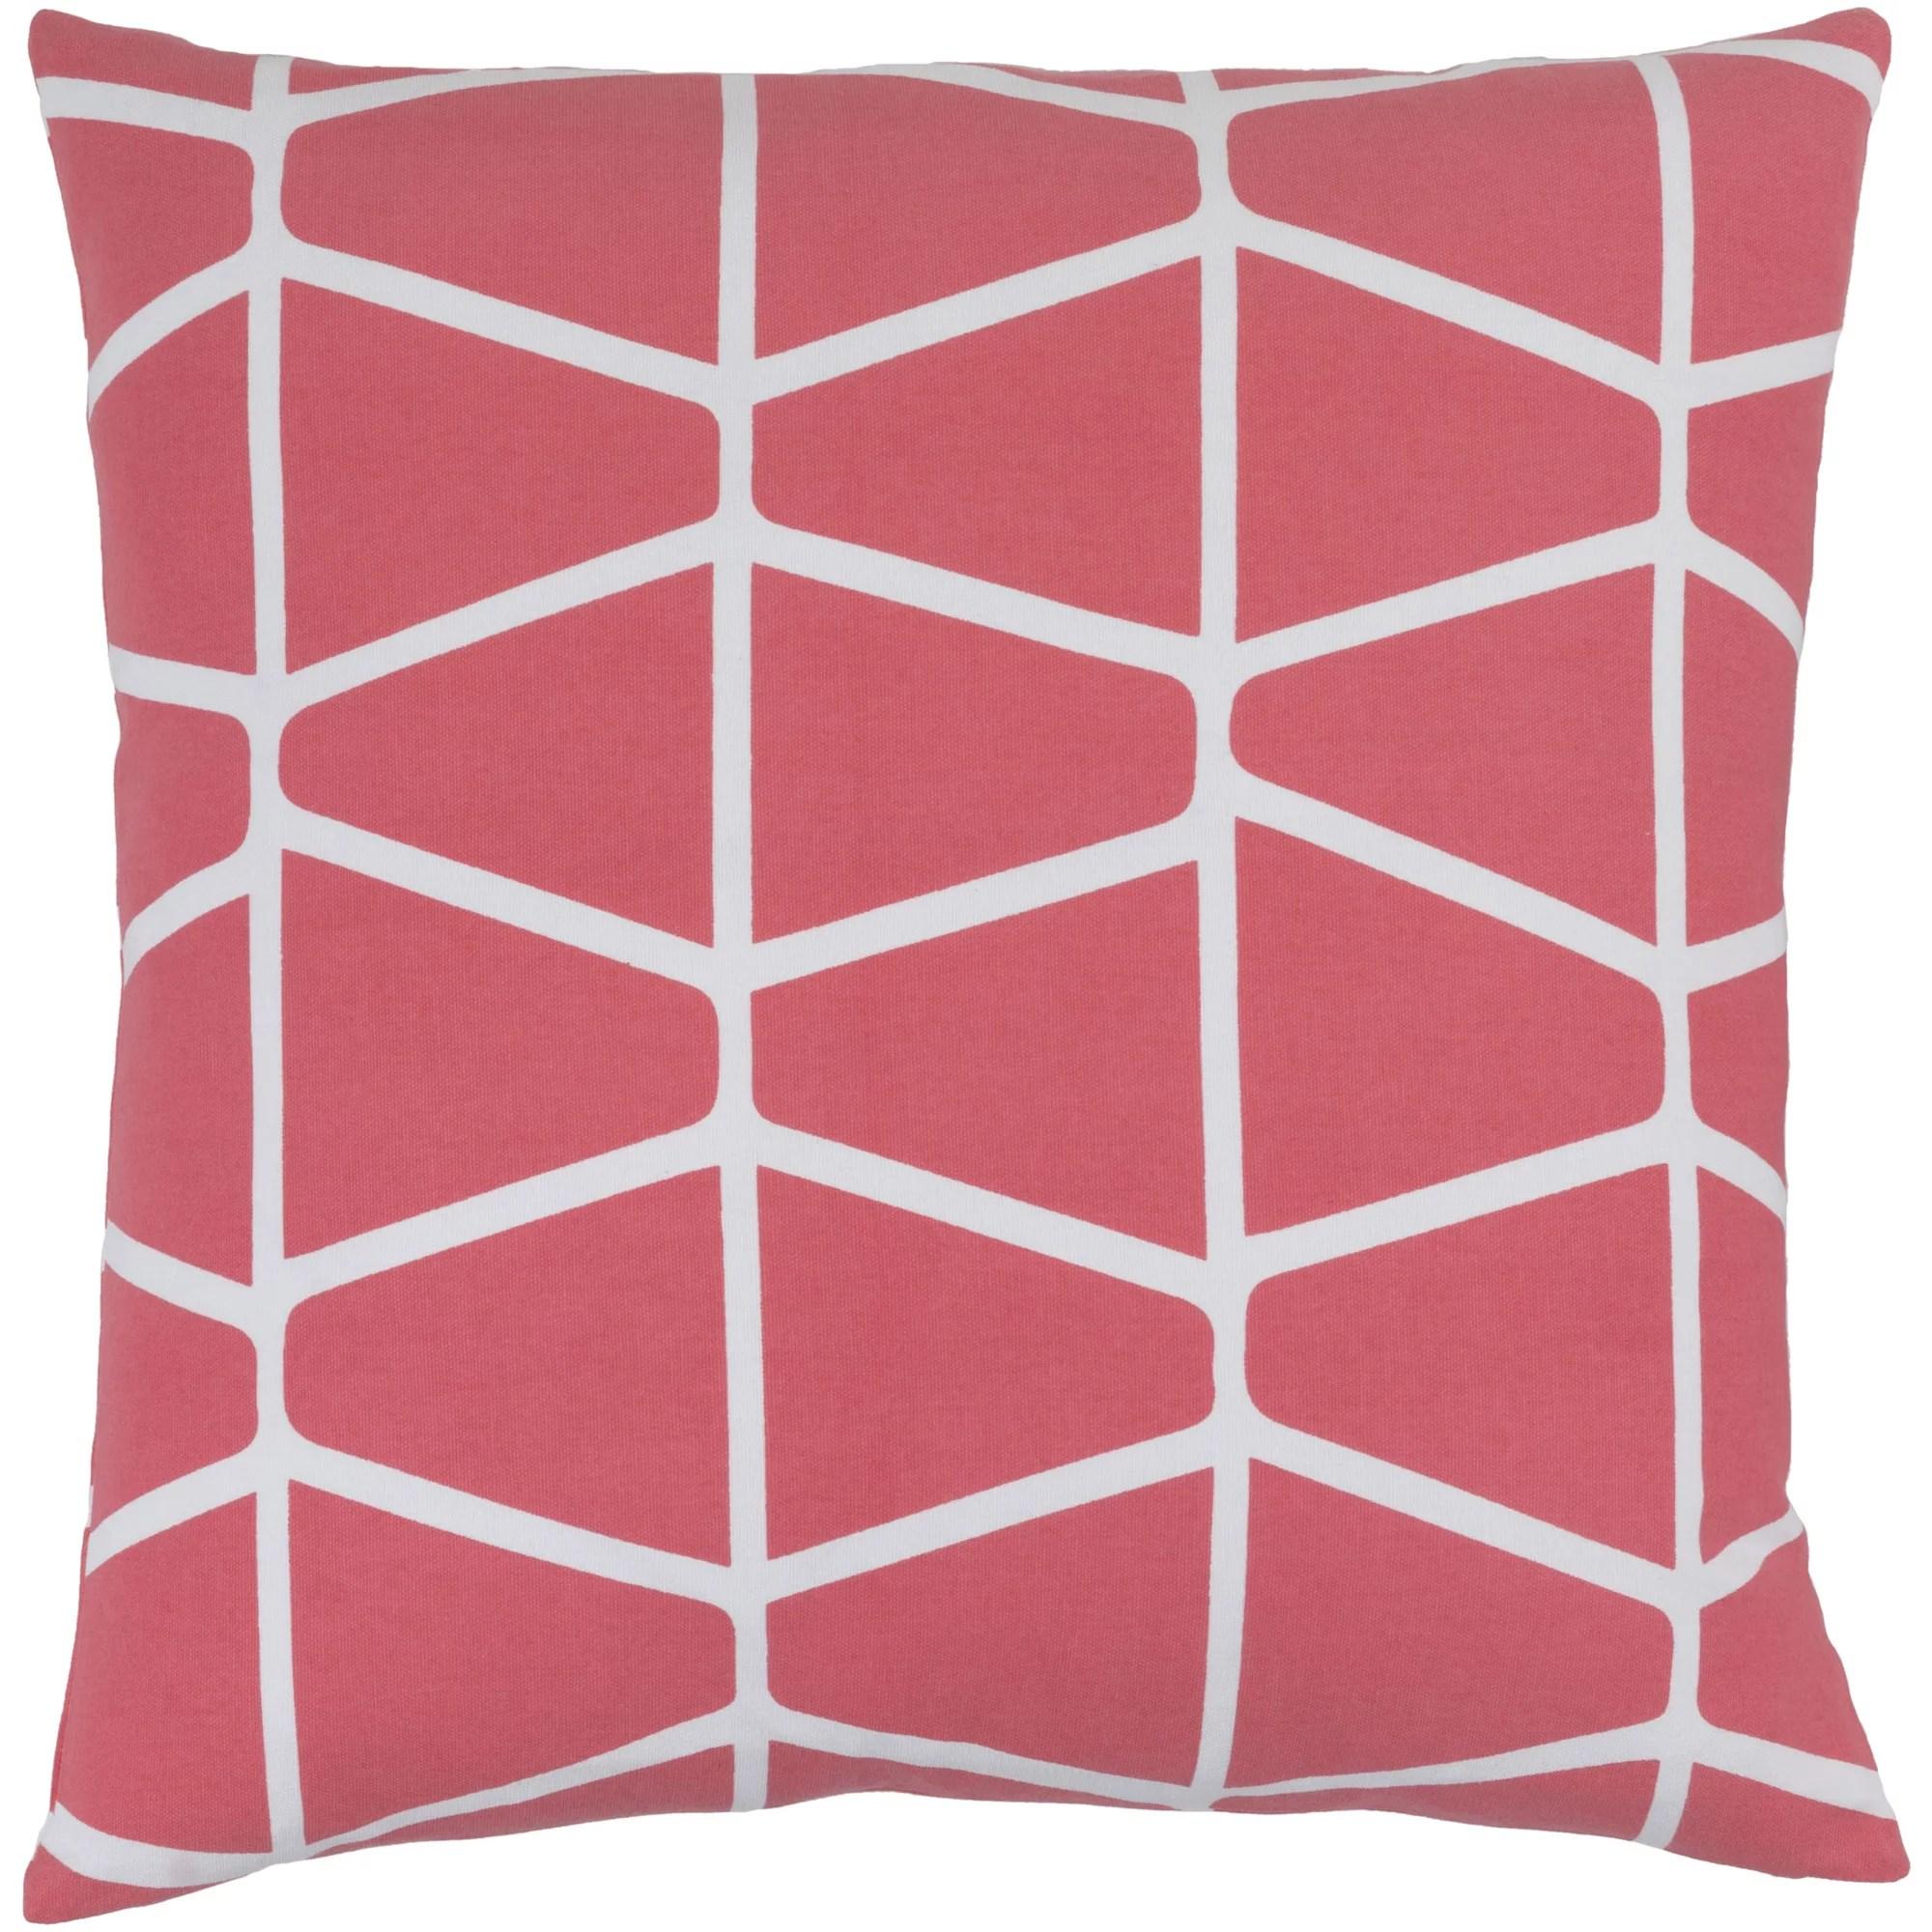 art of knot lanark 20 x 20 pillow cover walmart com walmart com